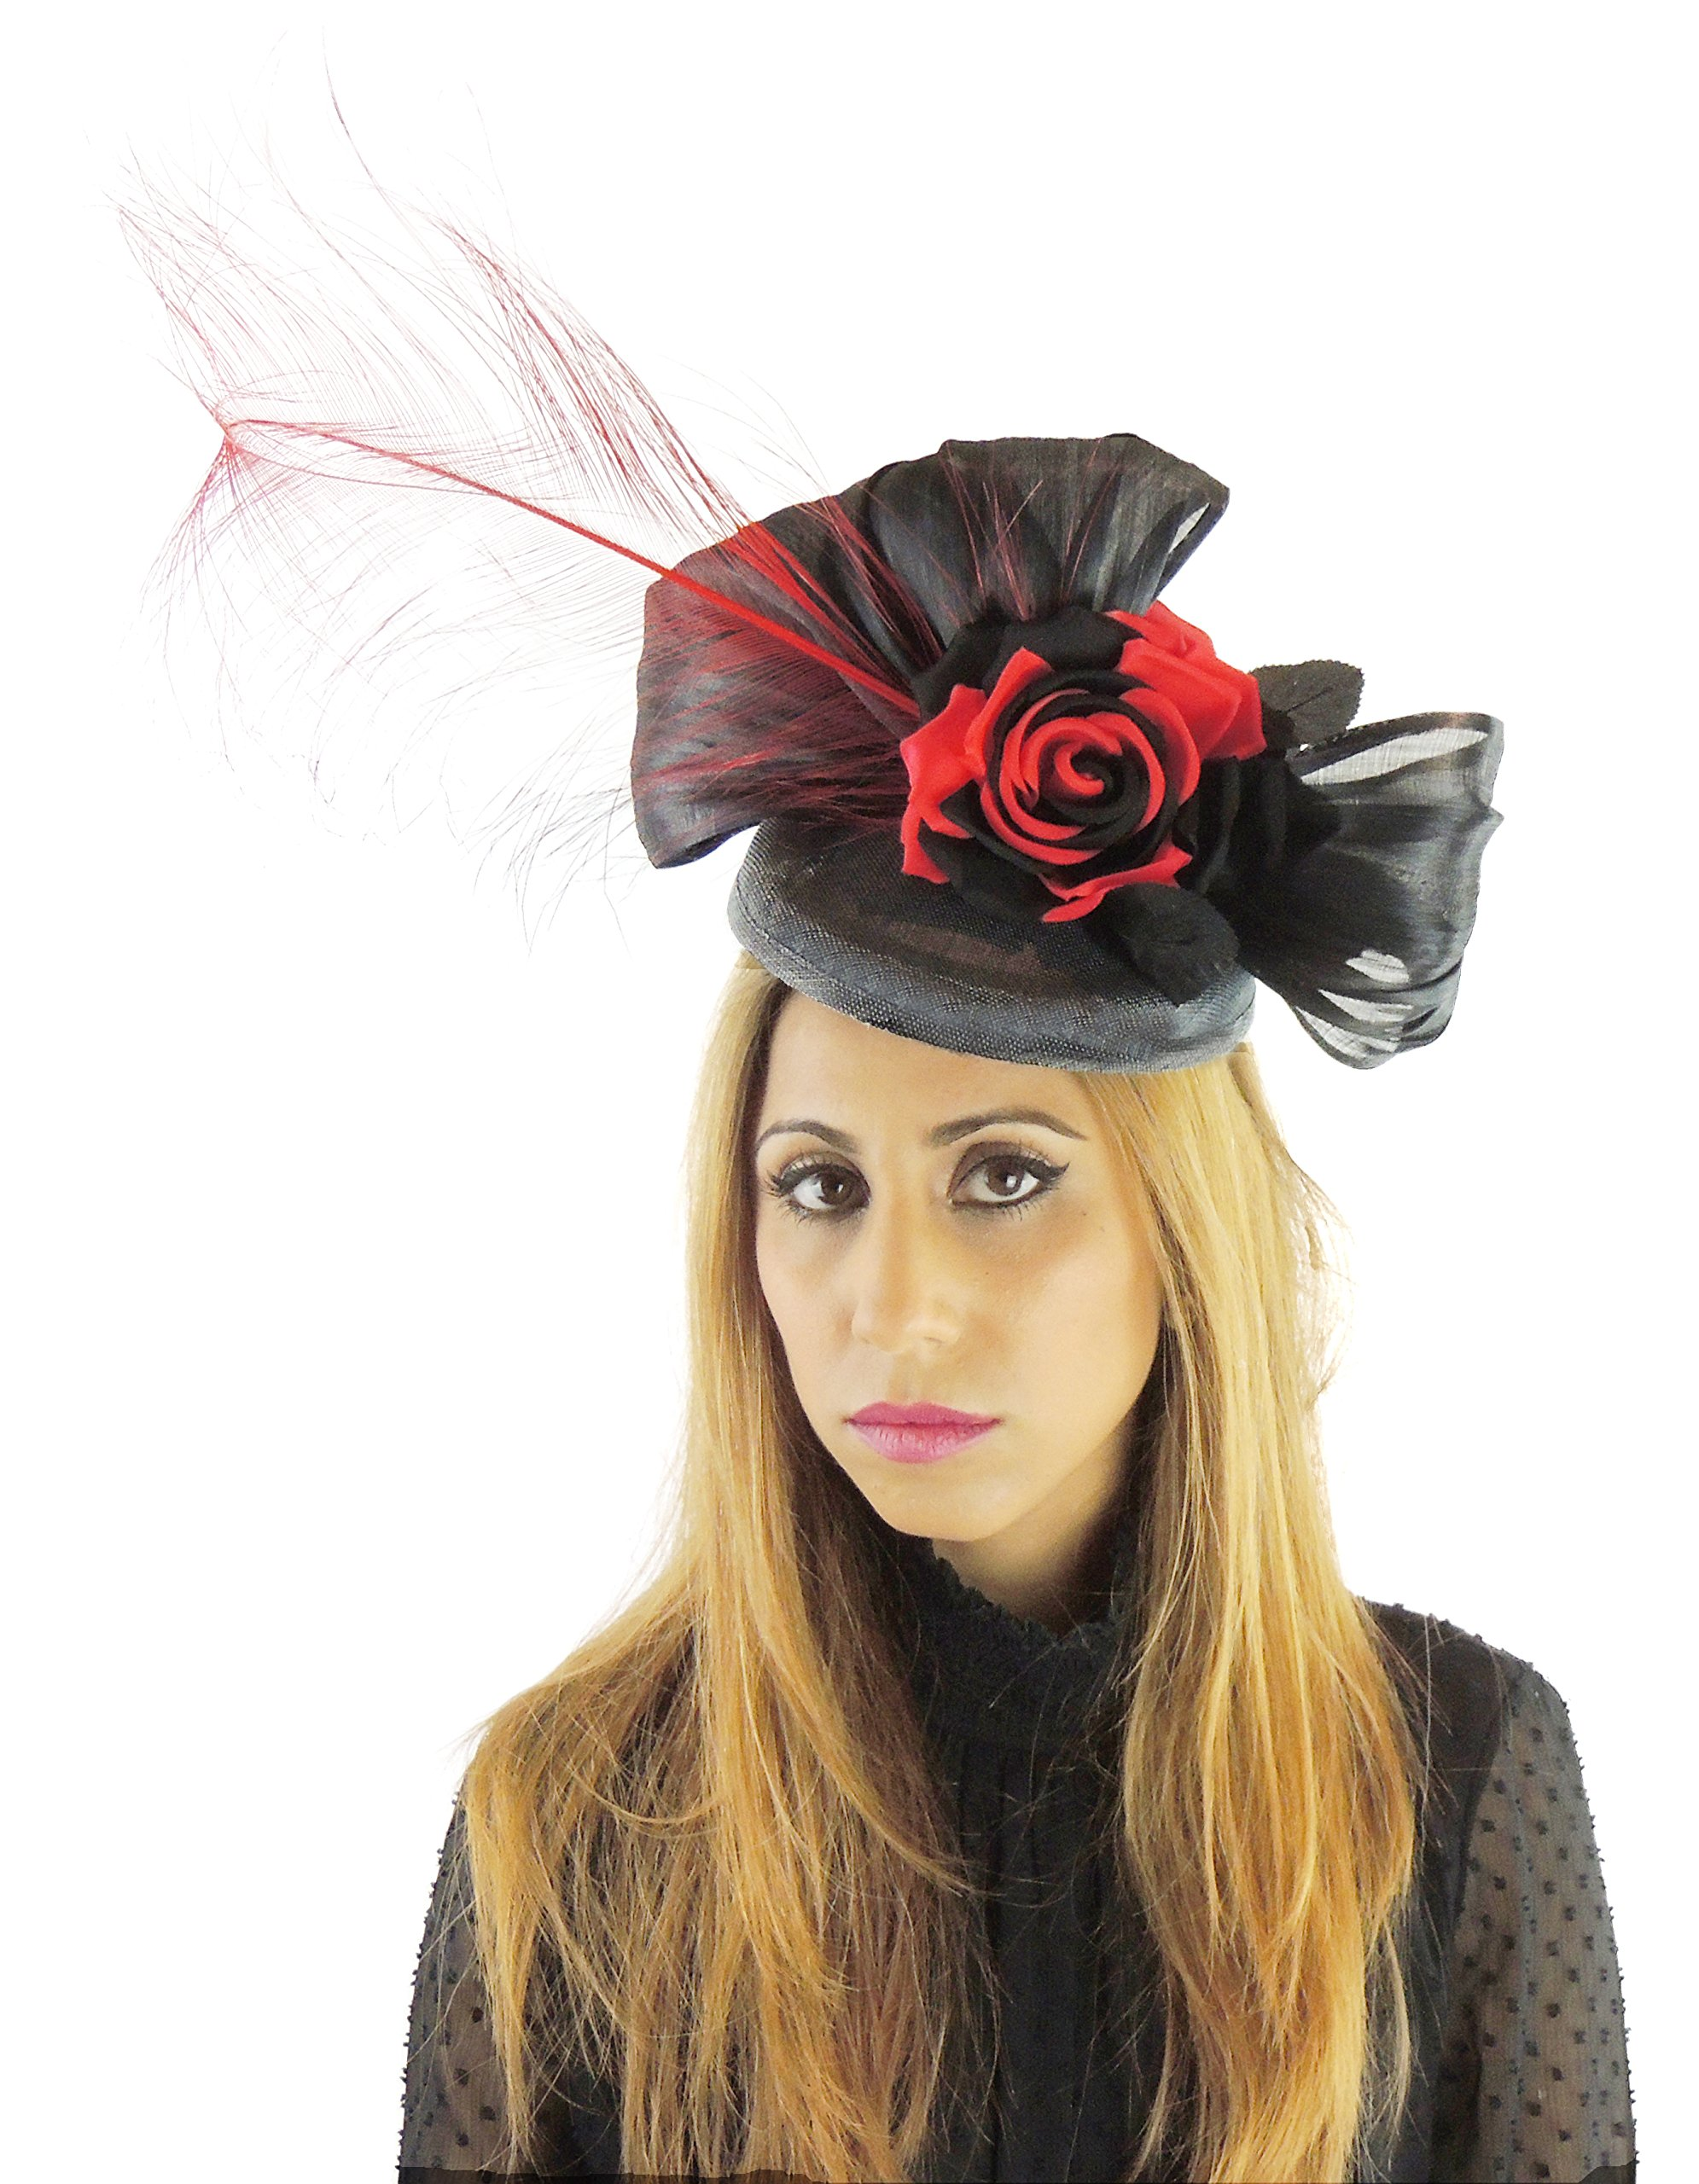 Hats By Cressida Silk Sinamay & Silk Flower Elegant Ladies Ascot Wedding Fascinator Hat Black & Red